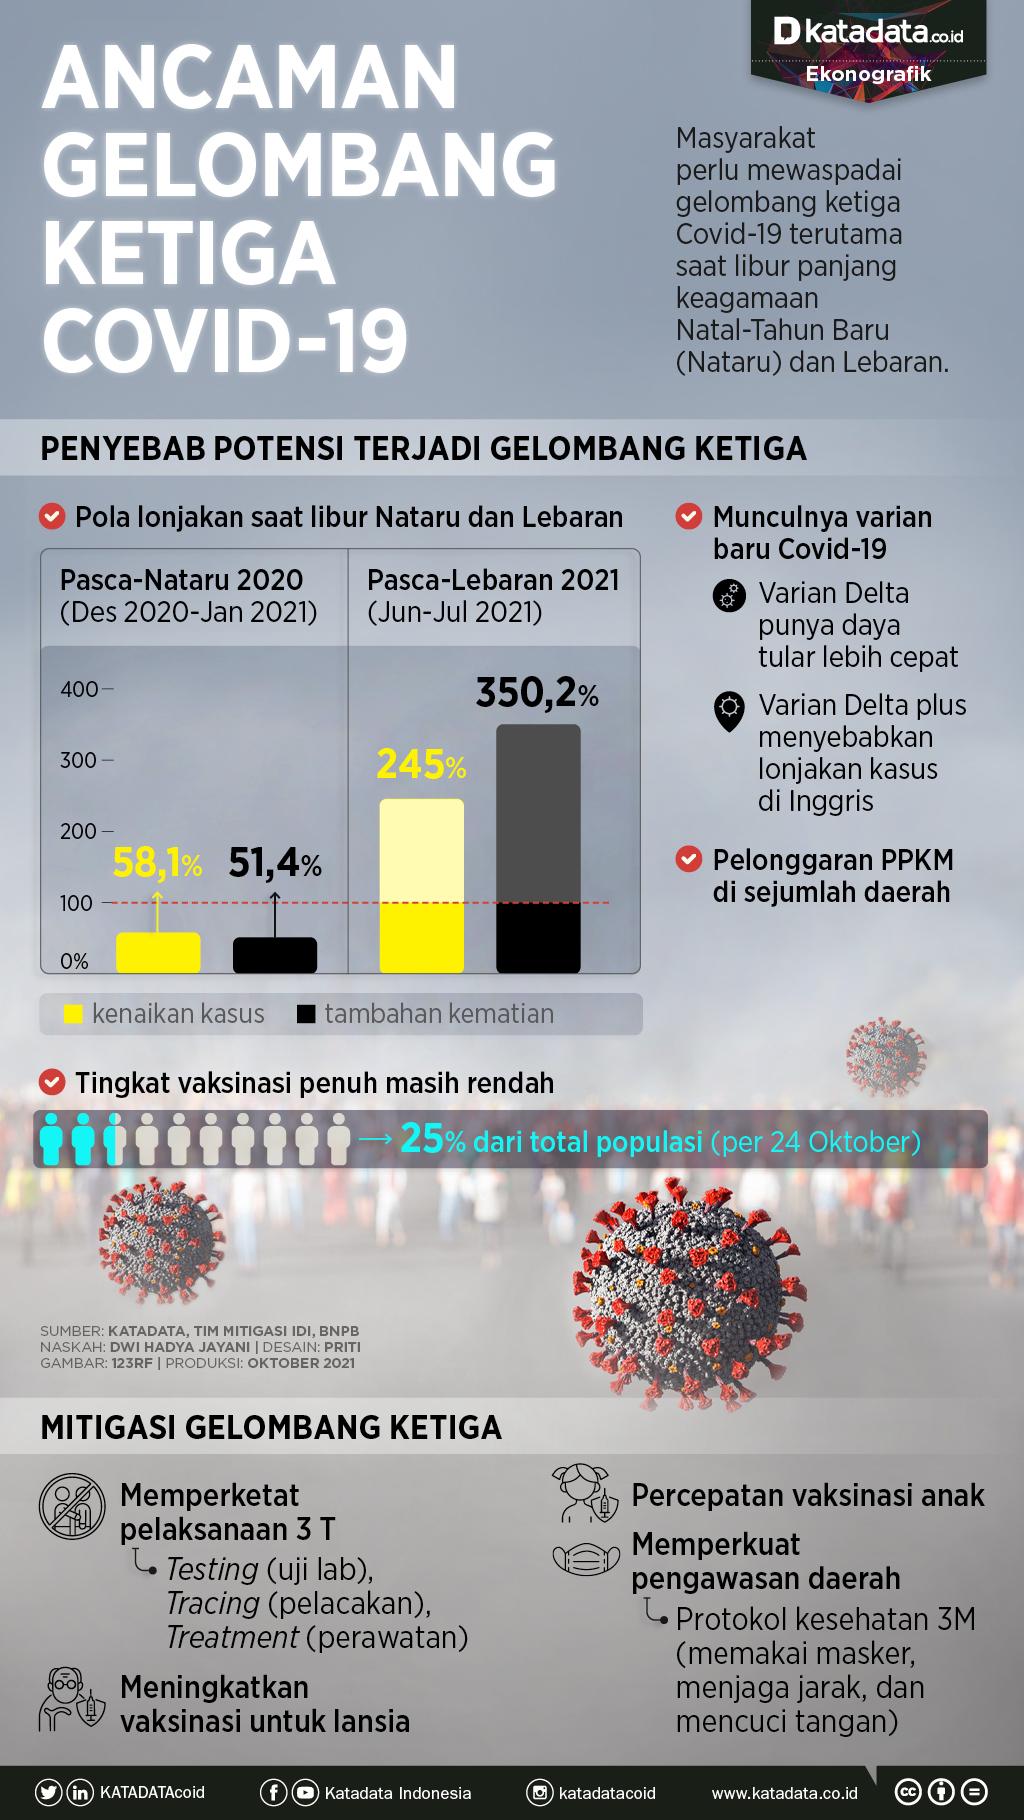 Infografik_Ancaman gelombang ketiga covid-19